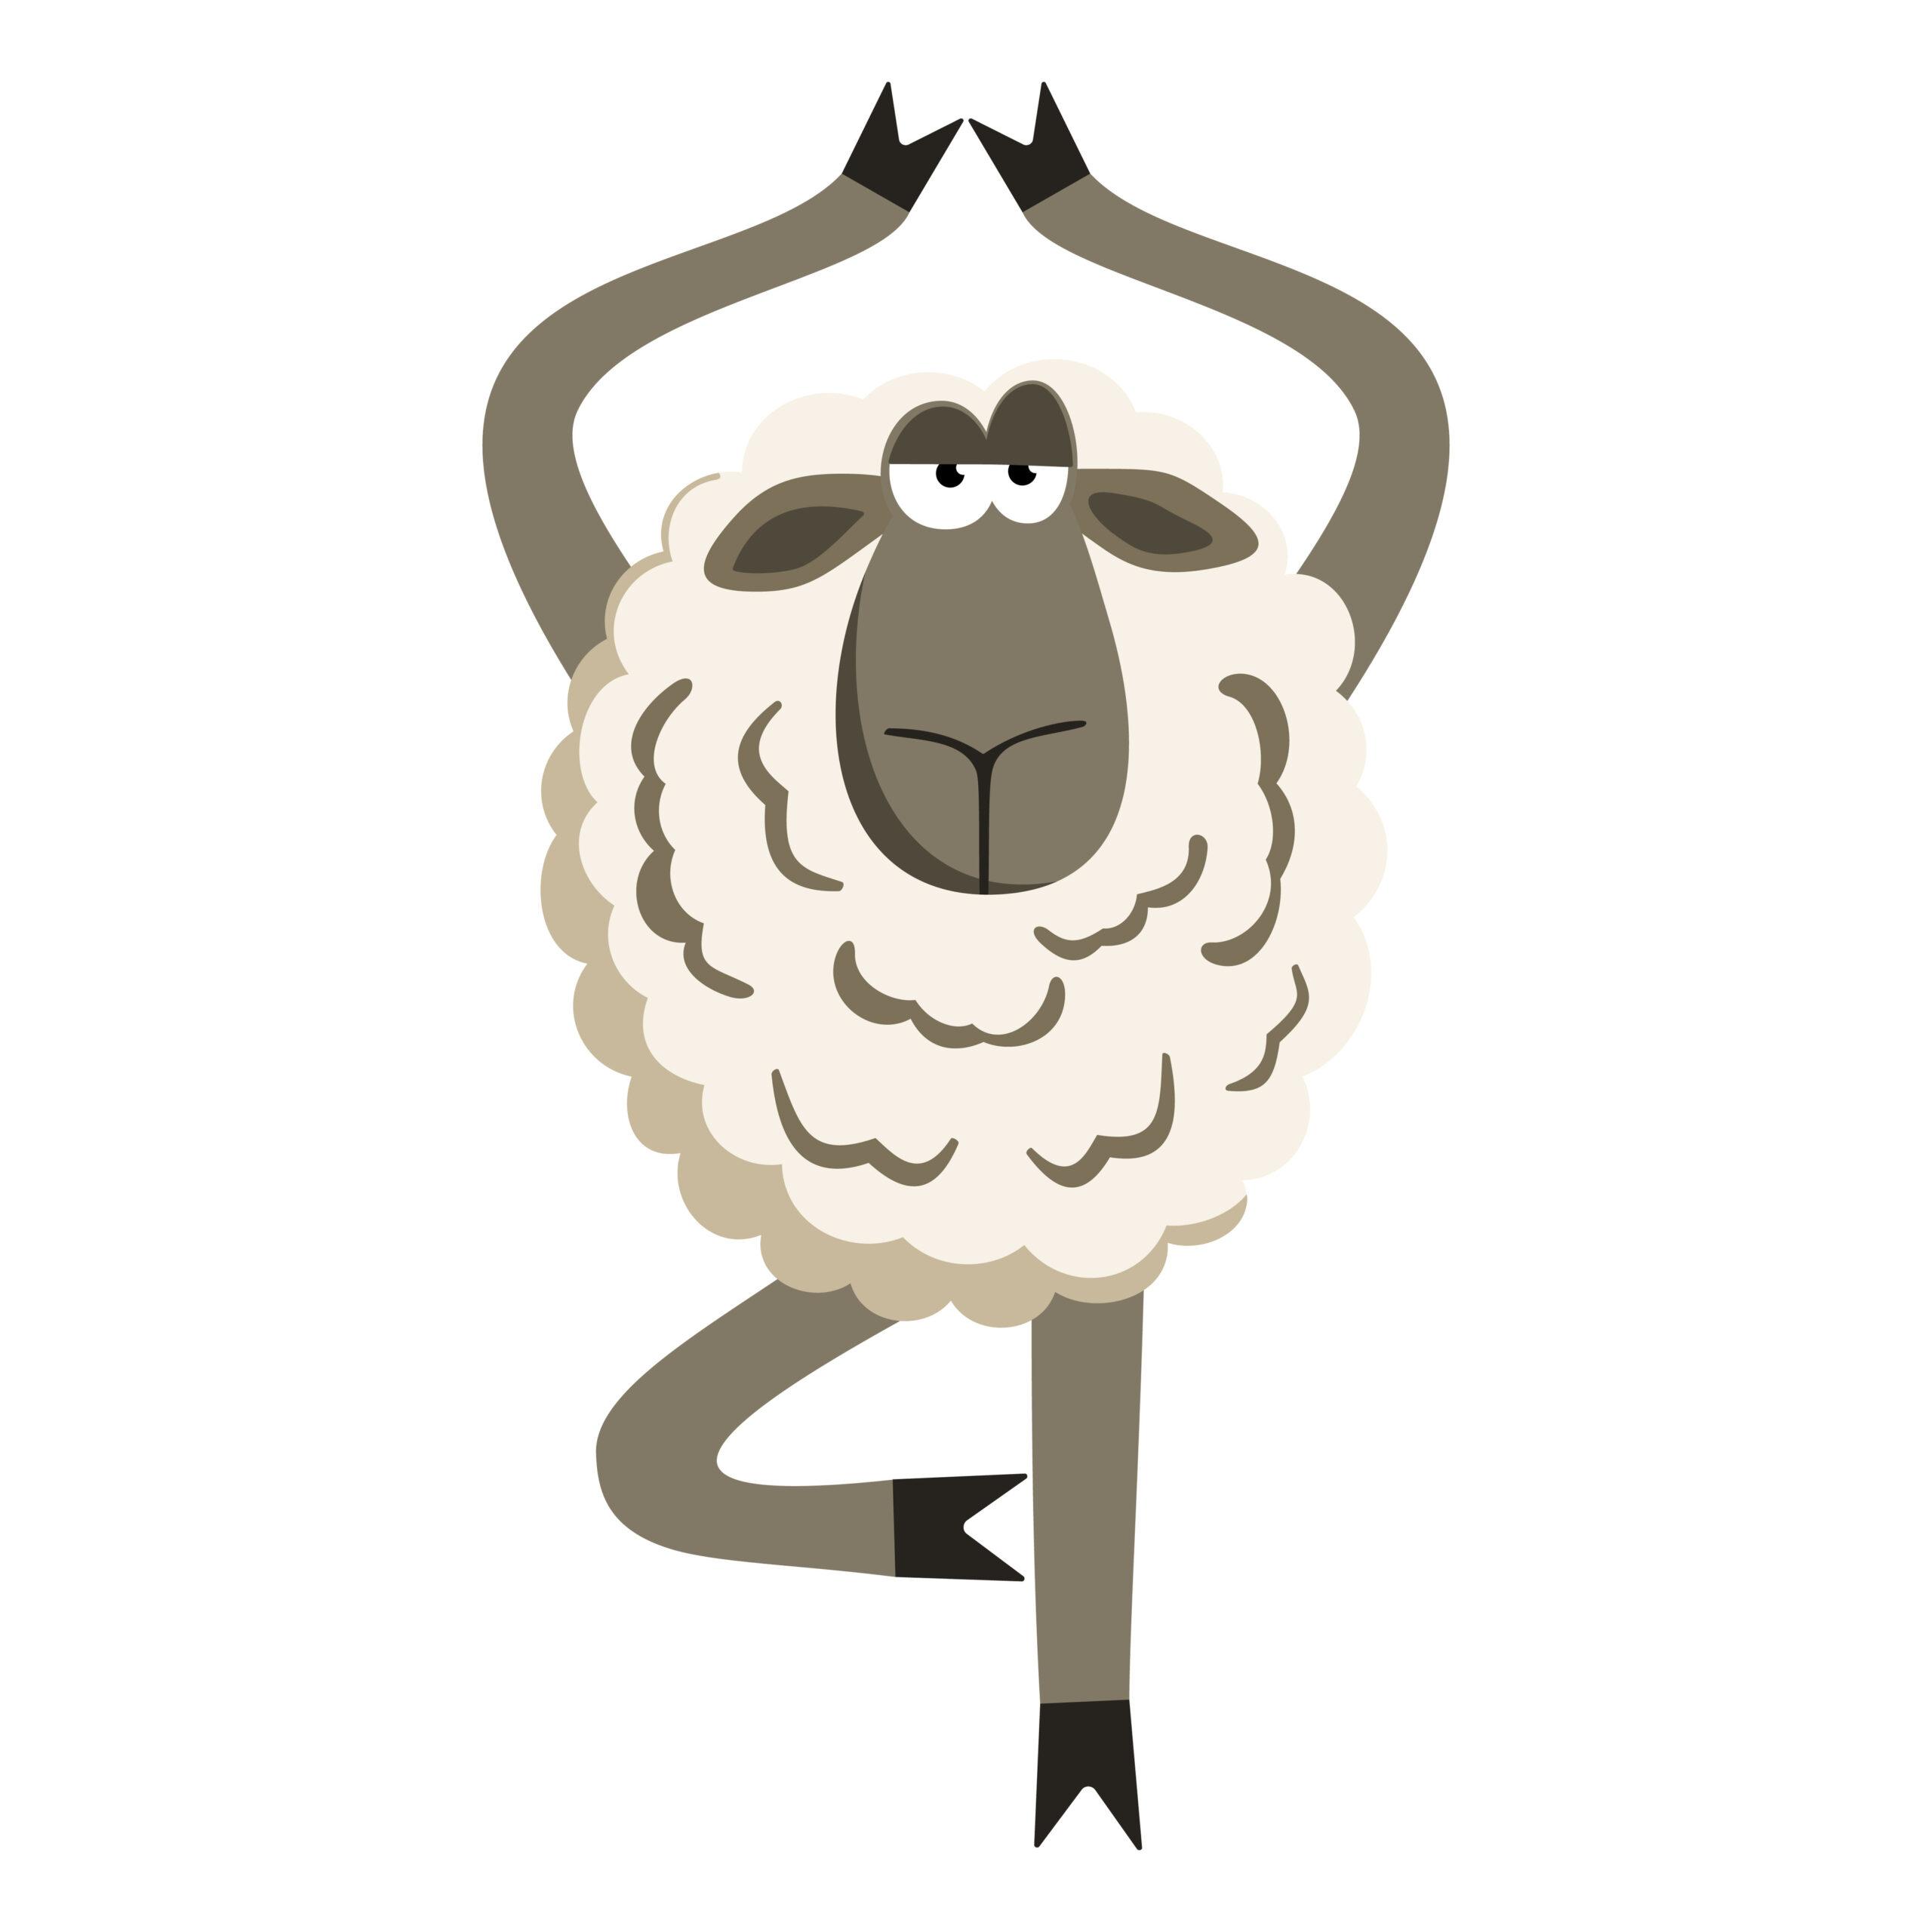 cartoon of lamb doing the tree pose.